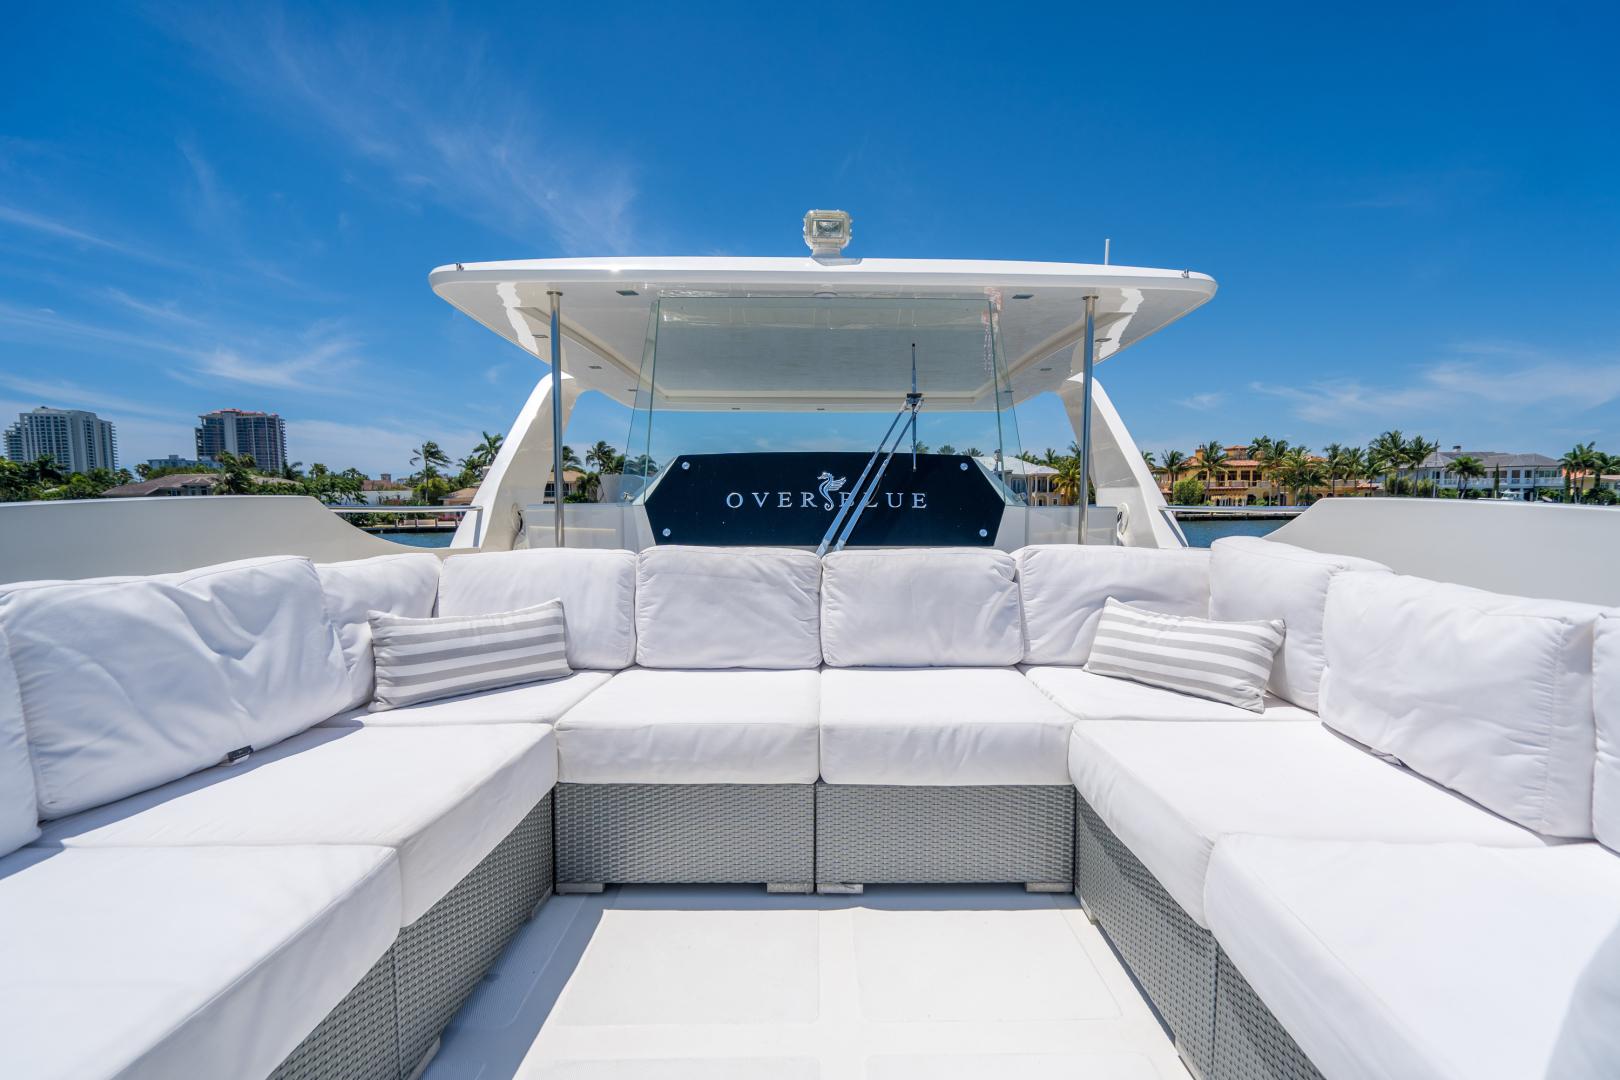 Overblue-58 Power Catamaran 2017-Techuila Ft. Lauderdale-Florida-United States-2017 Overblue 58 Powercat-1401219   Thumbnail